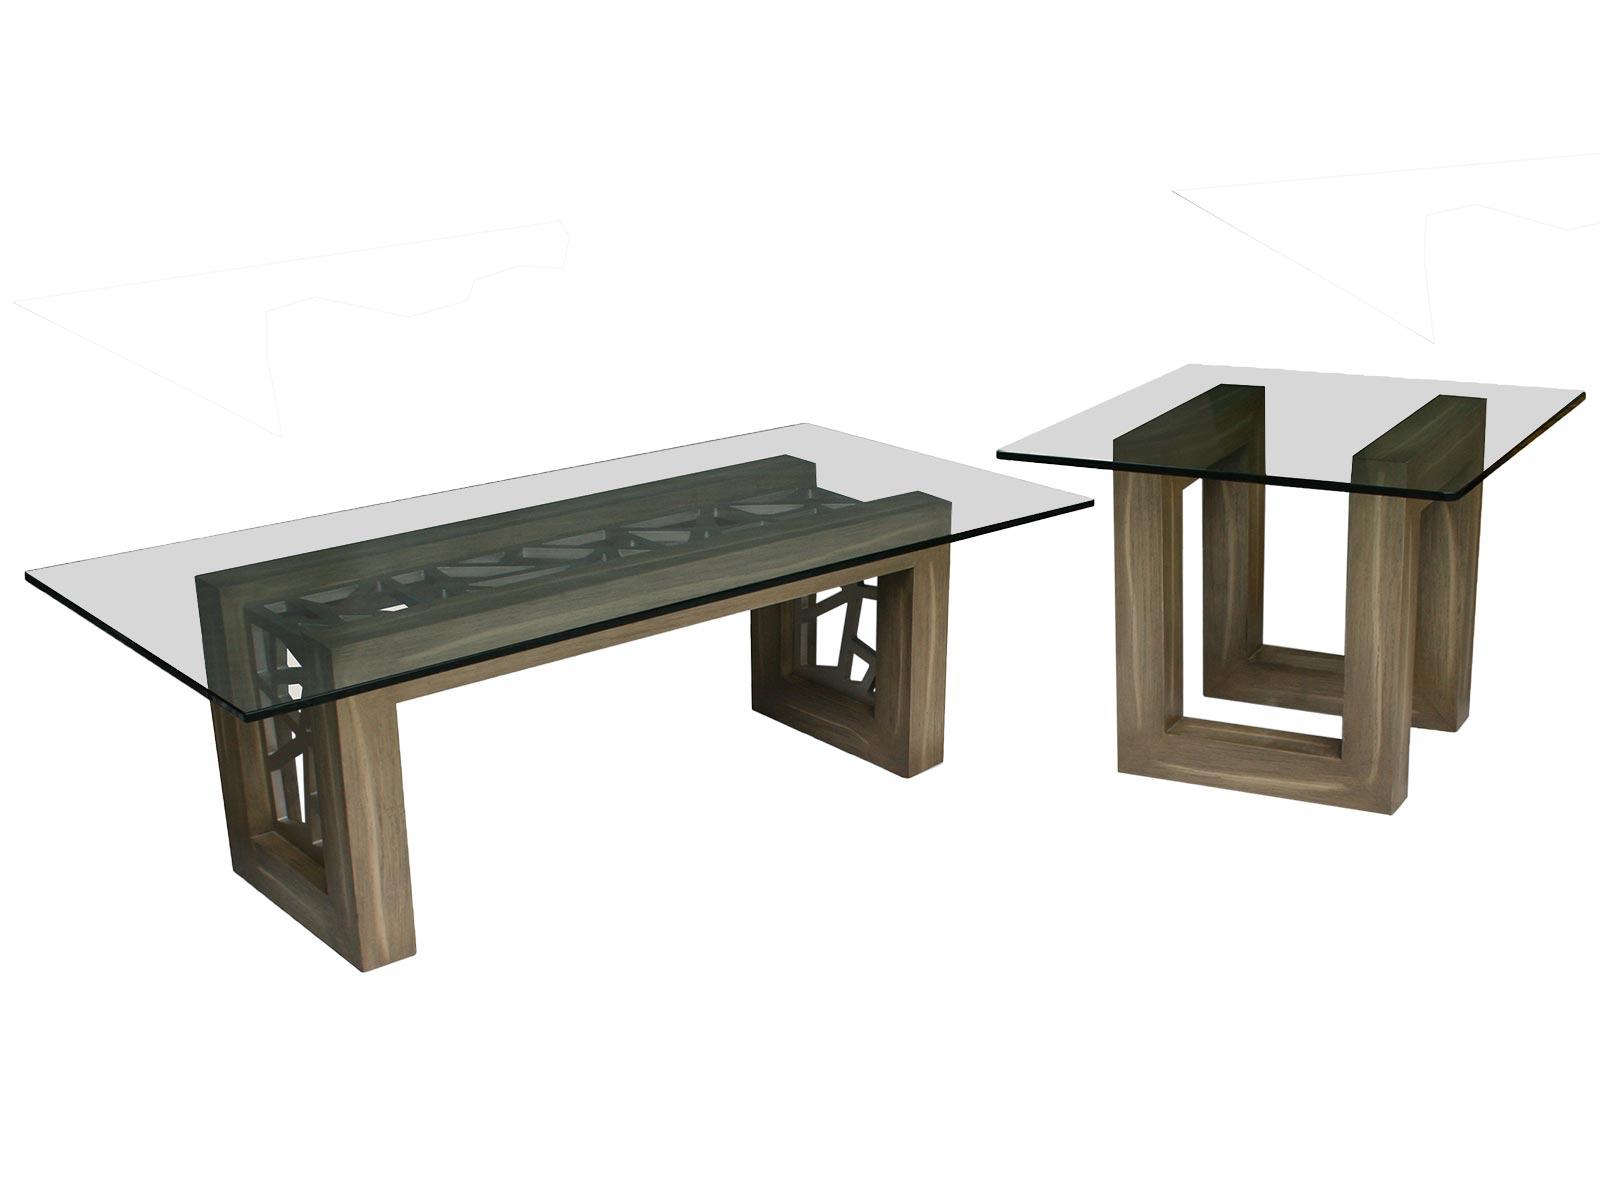 Mesas de Sala  Categorias de los productos  GRUPO UMMA